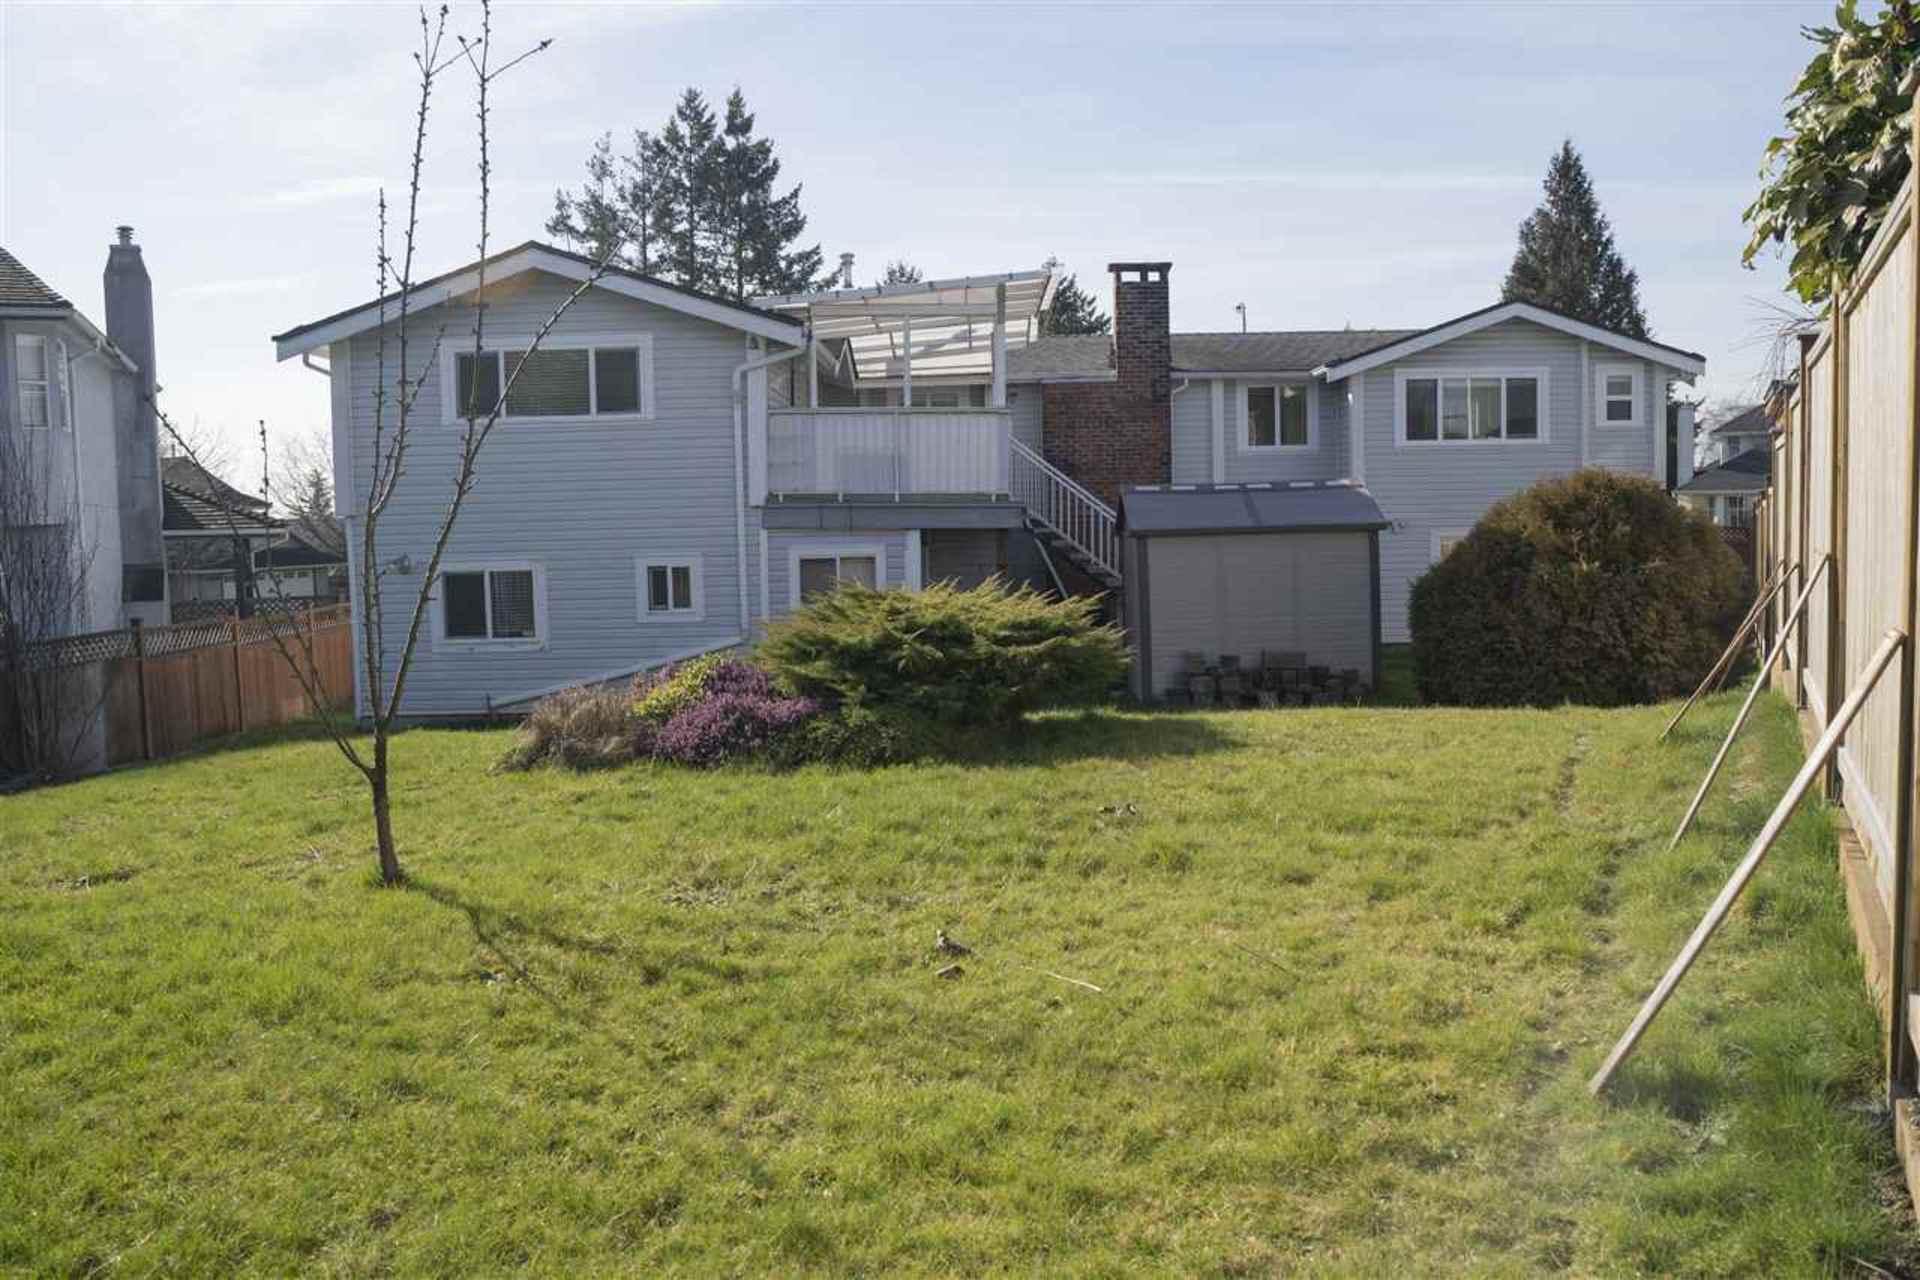 5770-185-street-cloverdale-bc-cloverdale-12 at 5770 185 Street, Cloverdale BC, Cloverdale